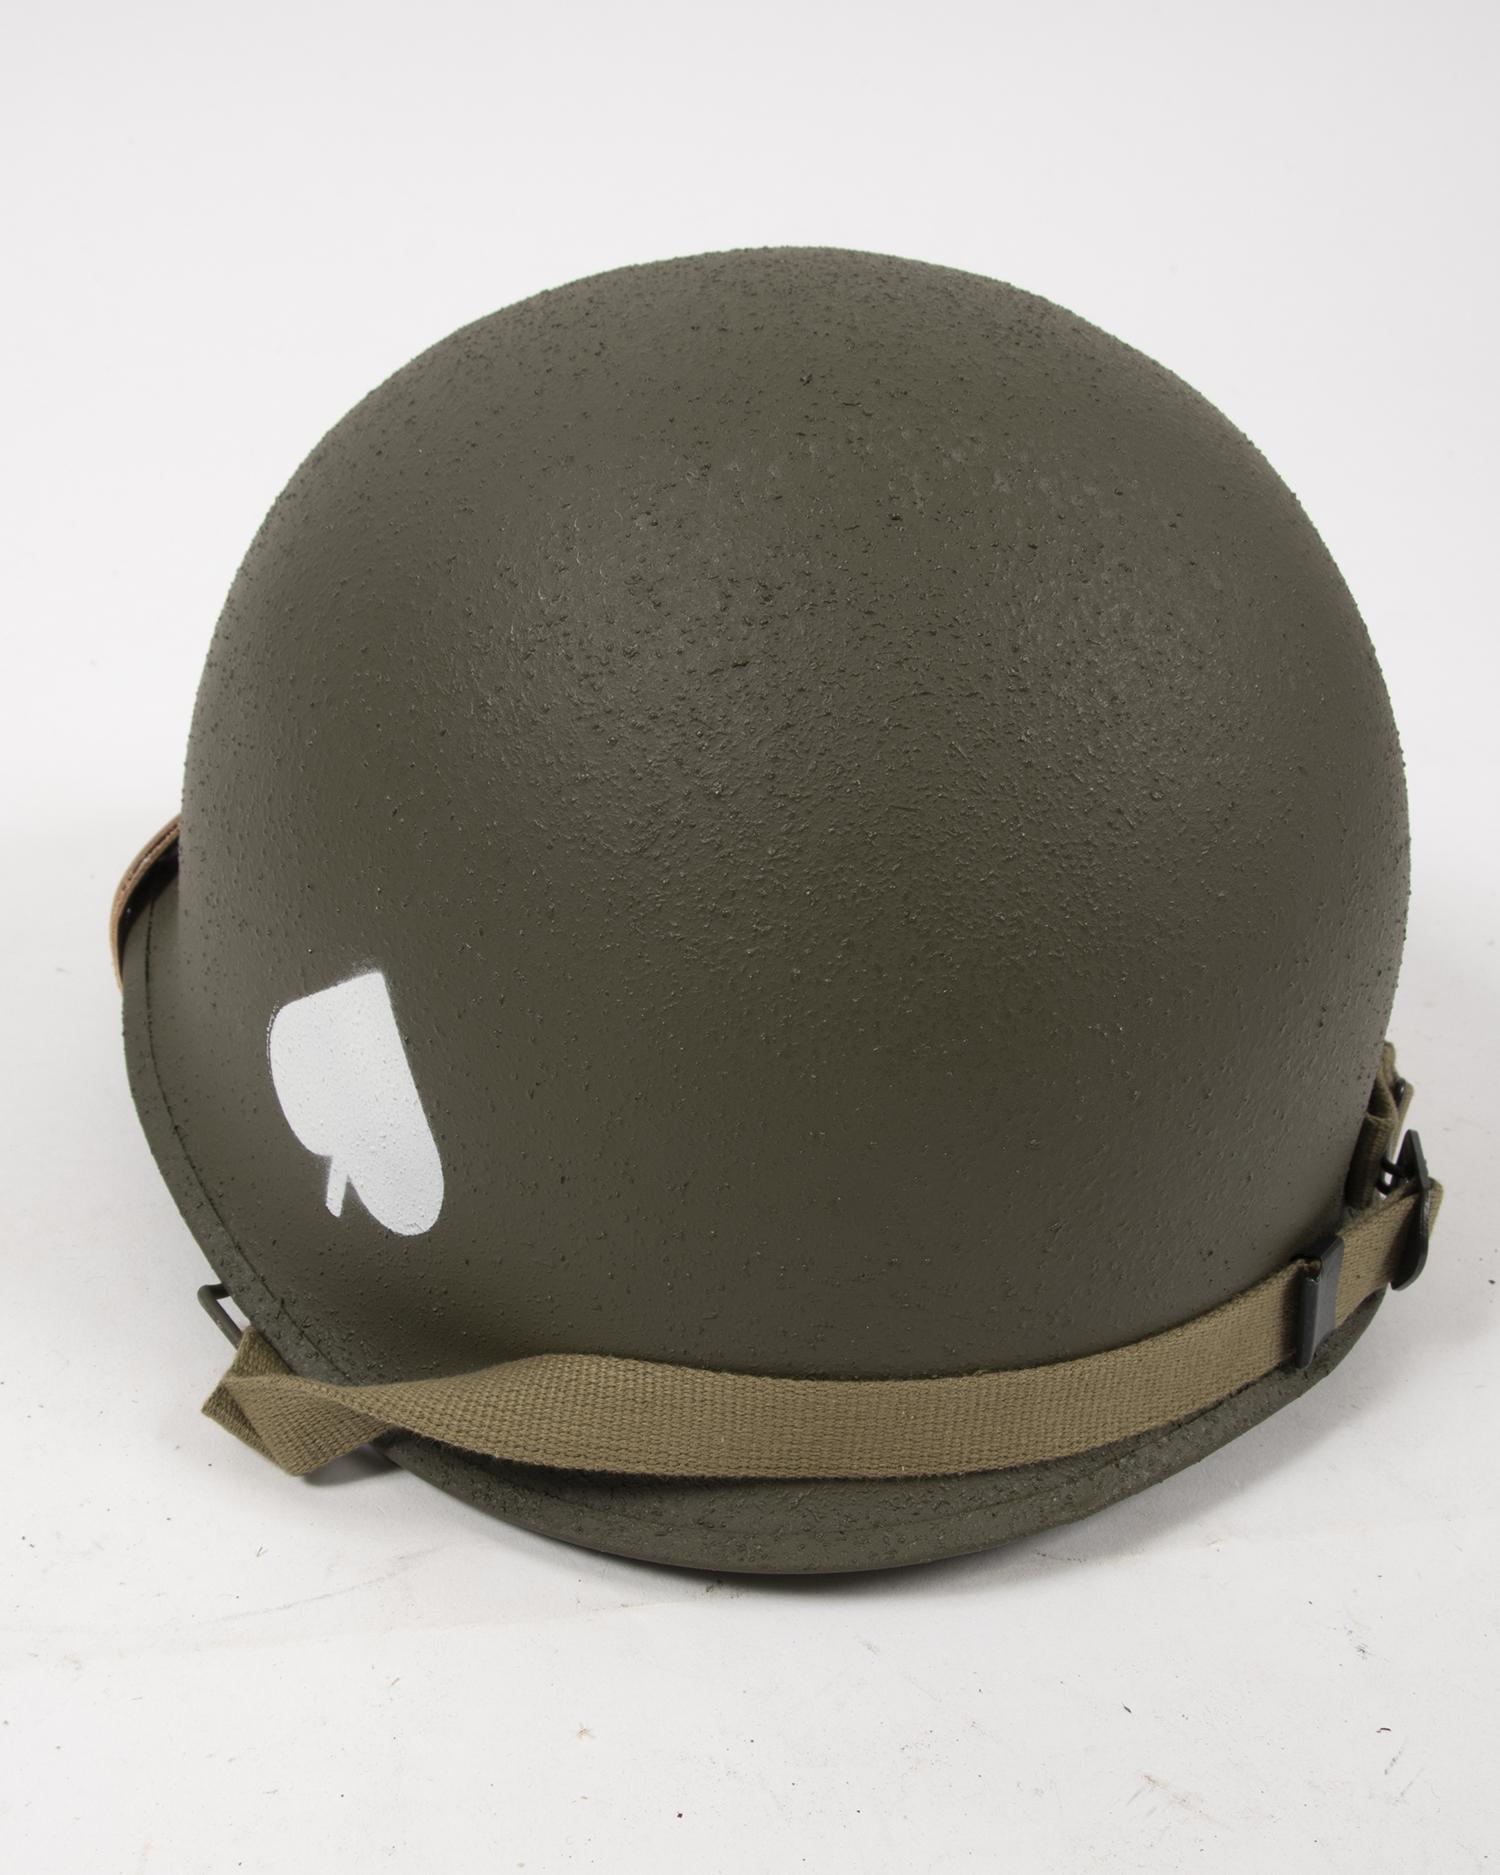 WWII Parts 506th Paratrooper Helmet